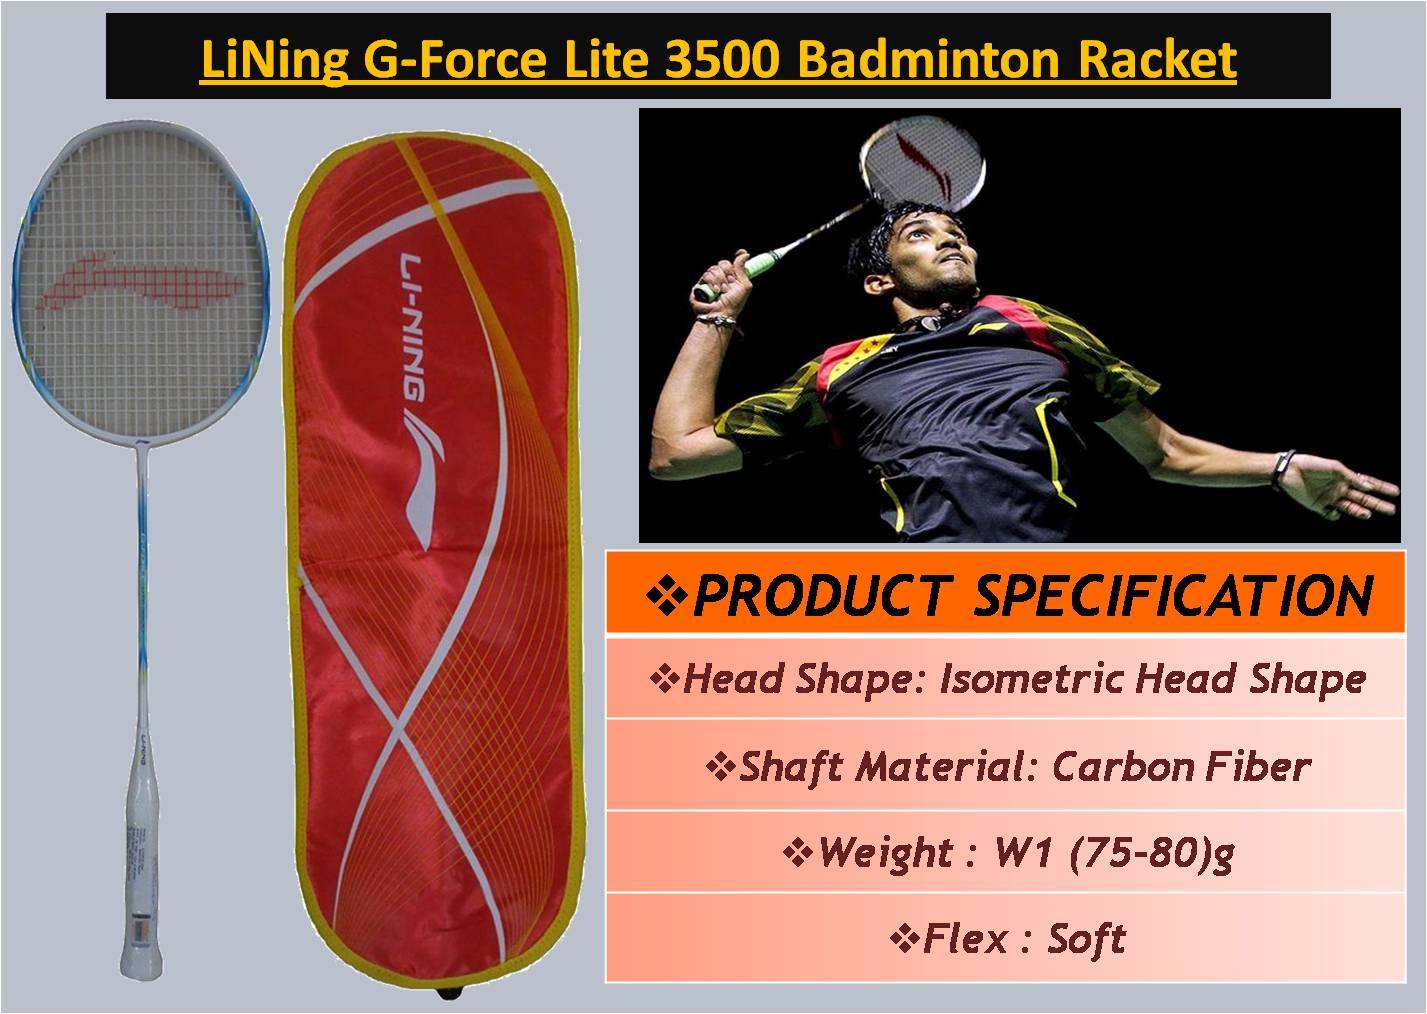 LiNing G-Force Lite 3500 Badminton Racket